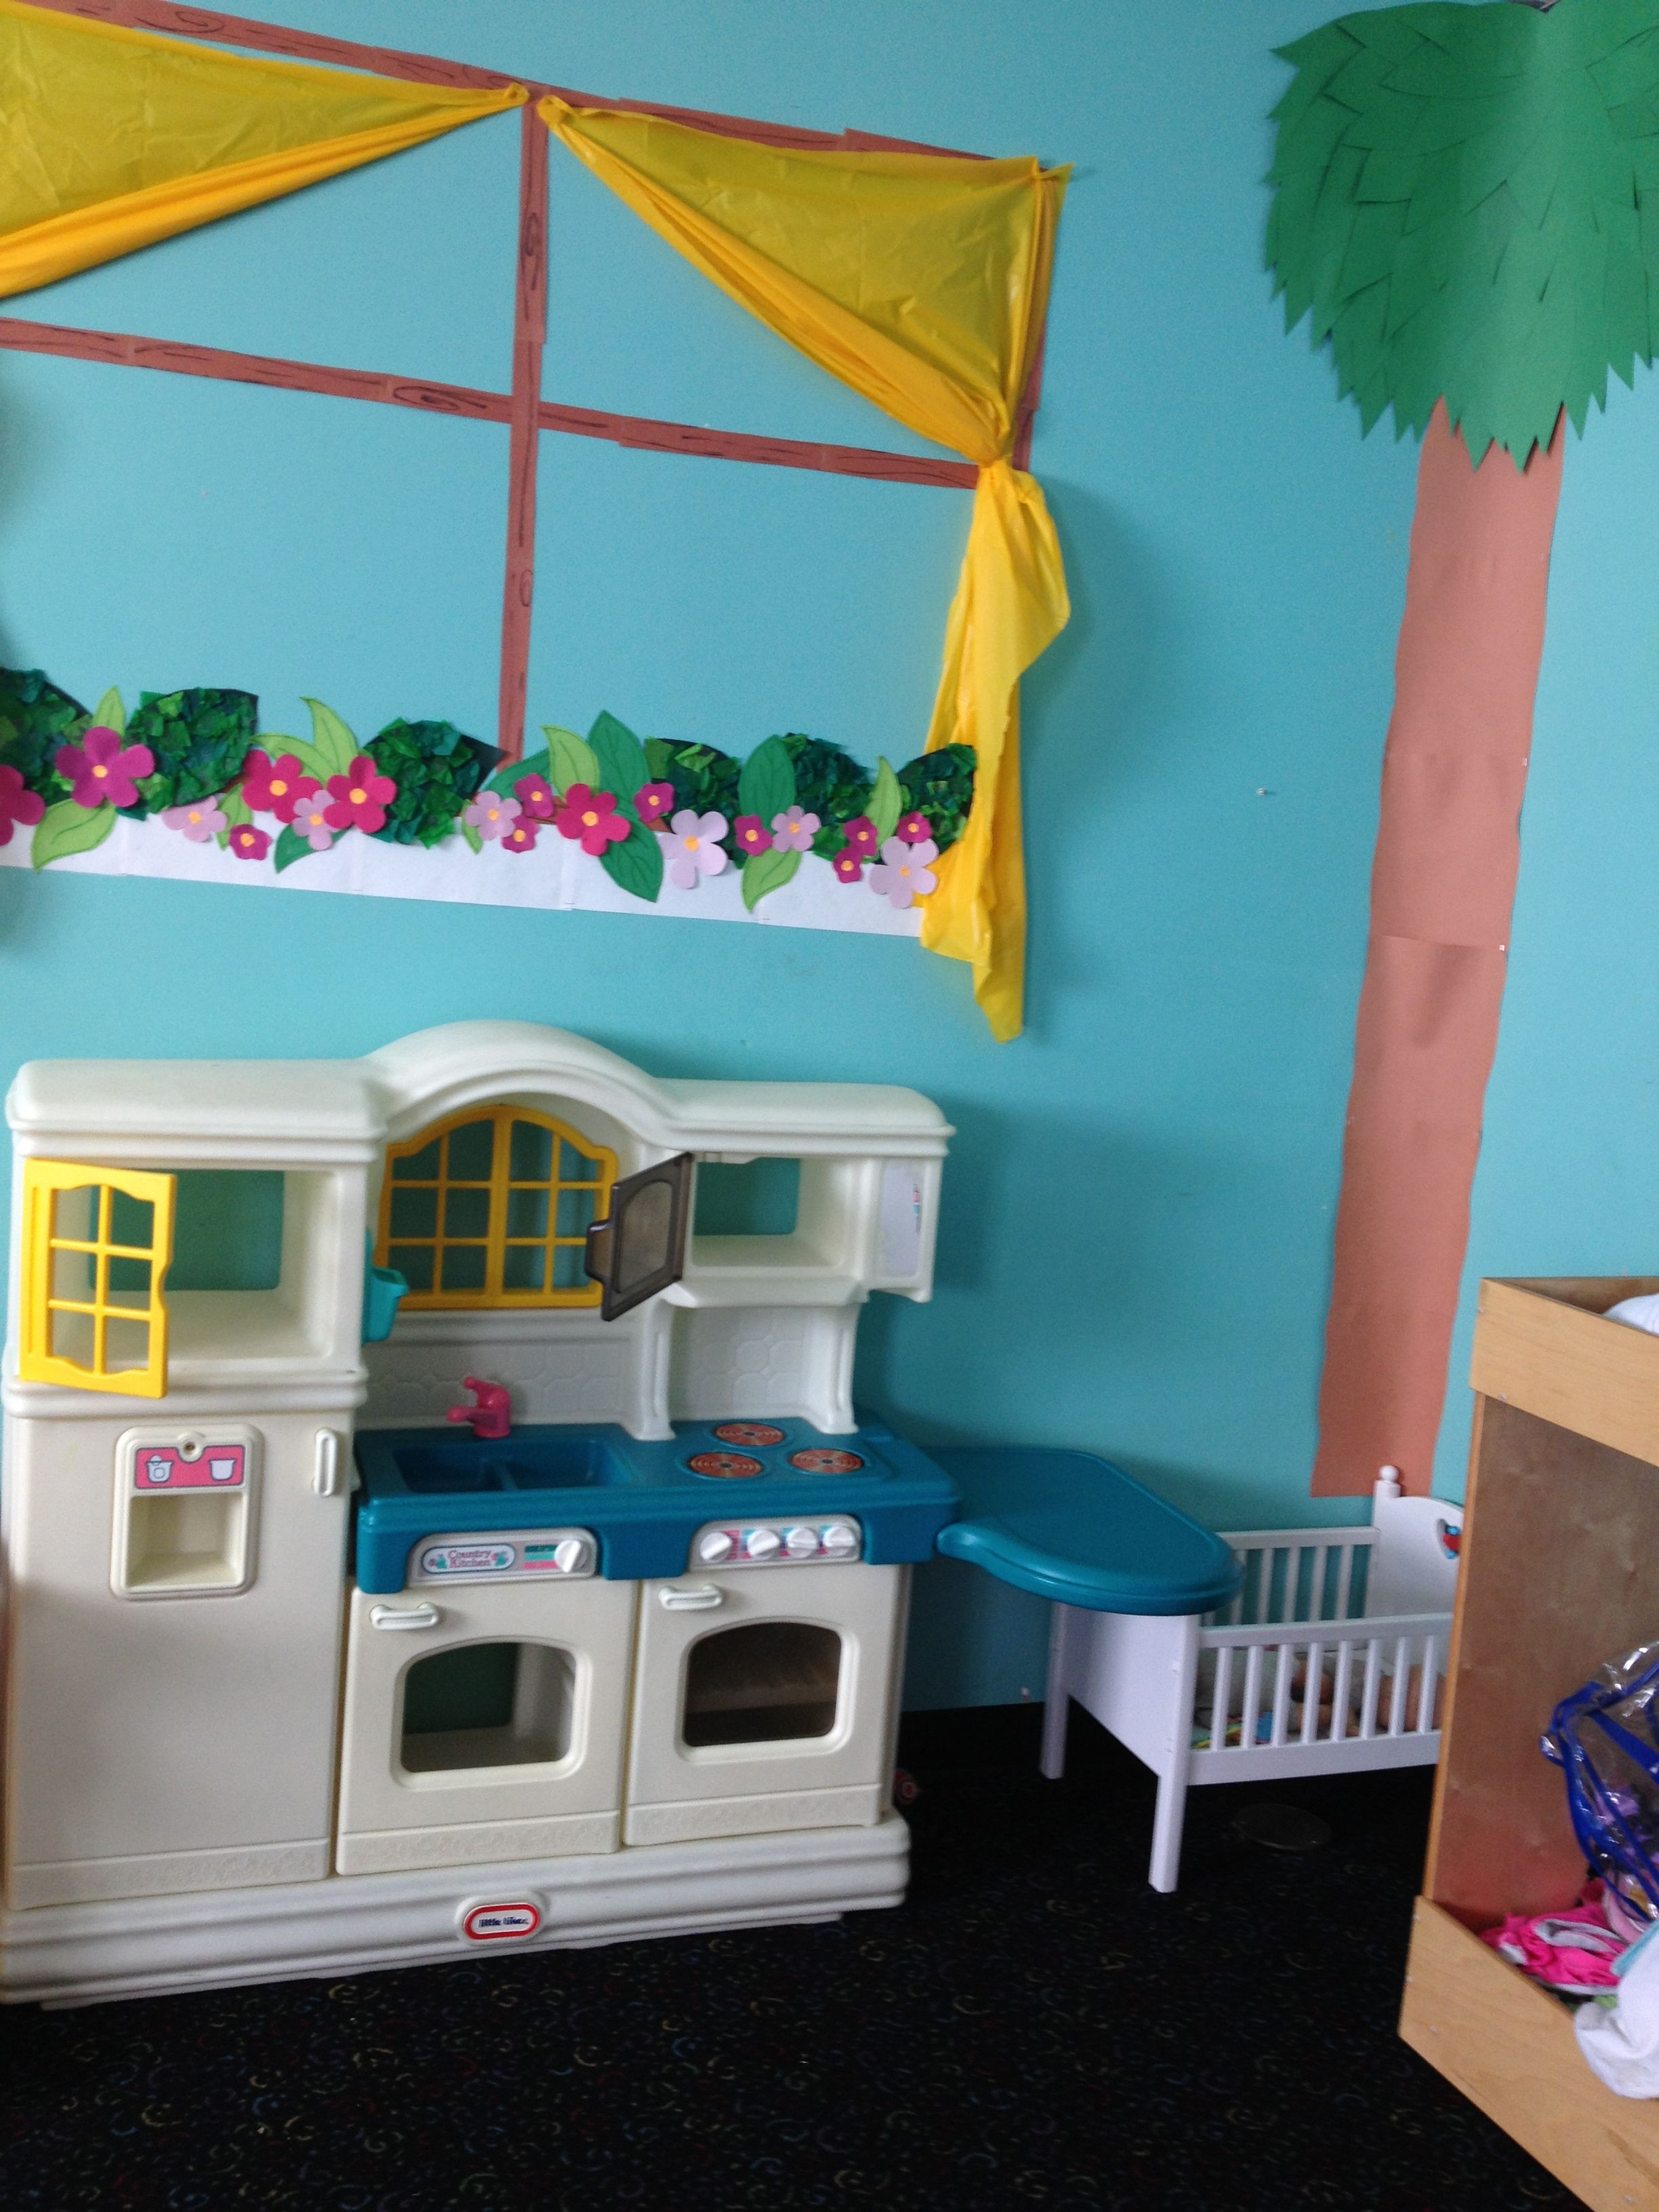 Preschool Classroom Creative Dramatic Play Dress Up House